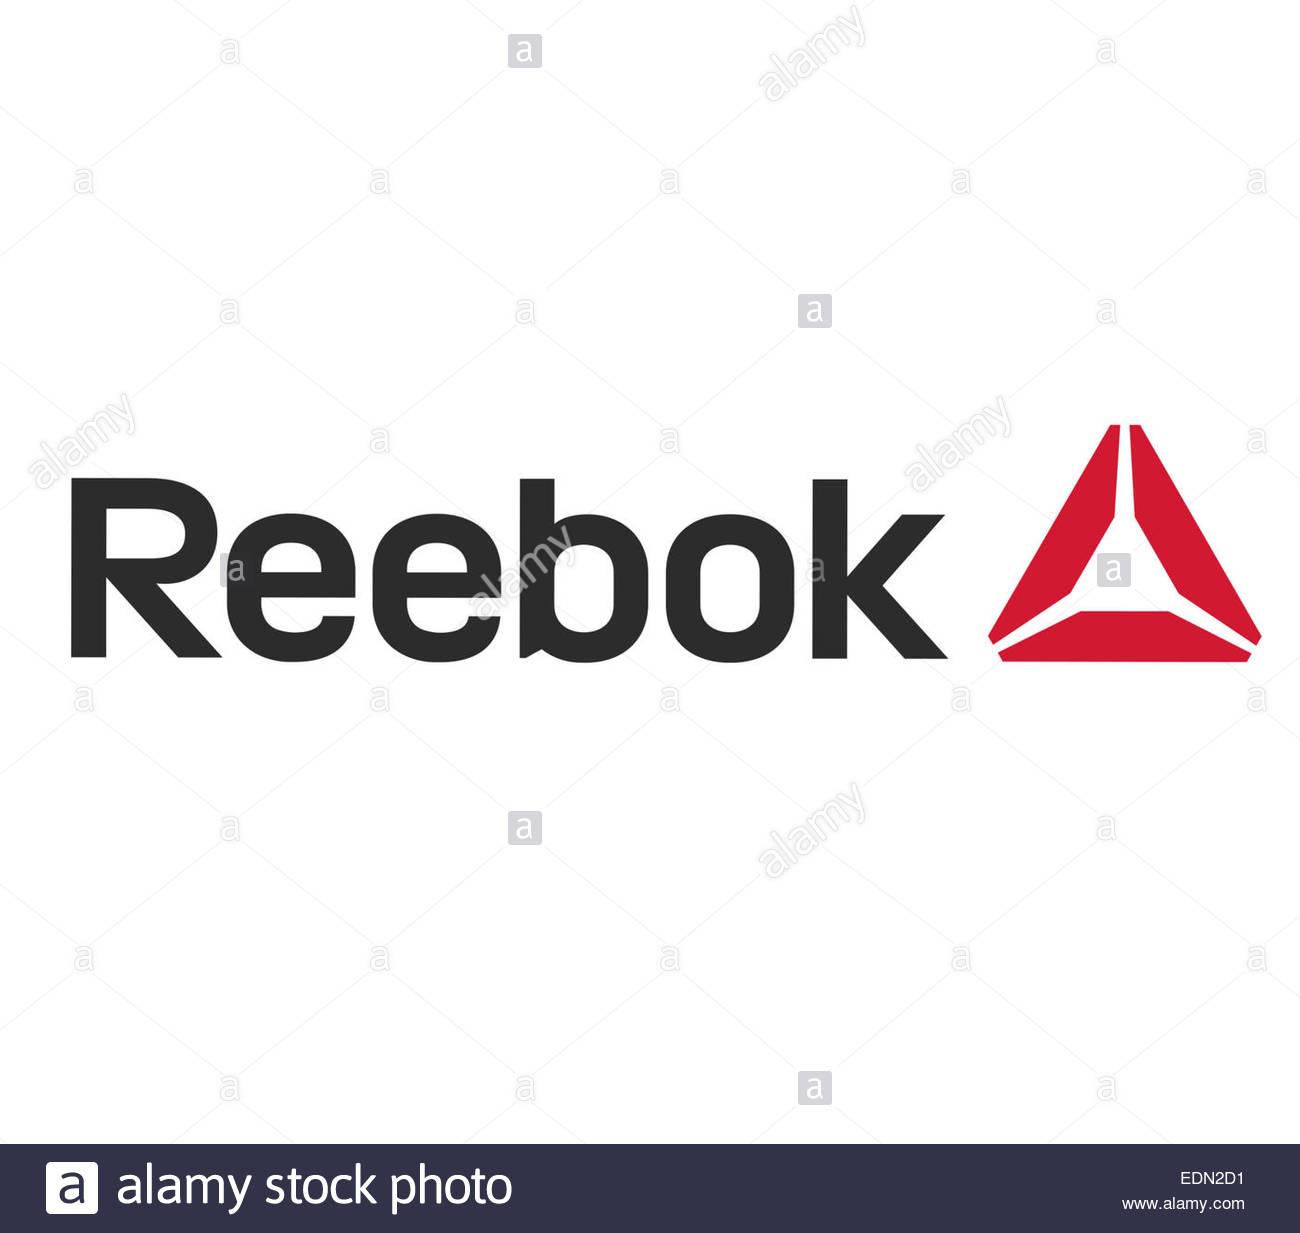 79058e5585b1f0 Reebok Logo Stock Photos   Reebok Logo Stock Images - Alamy